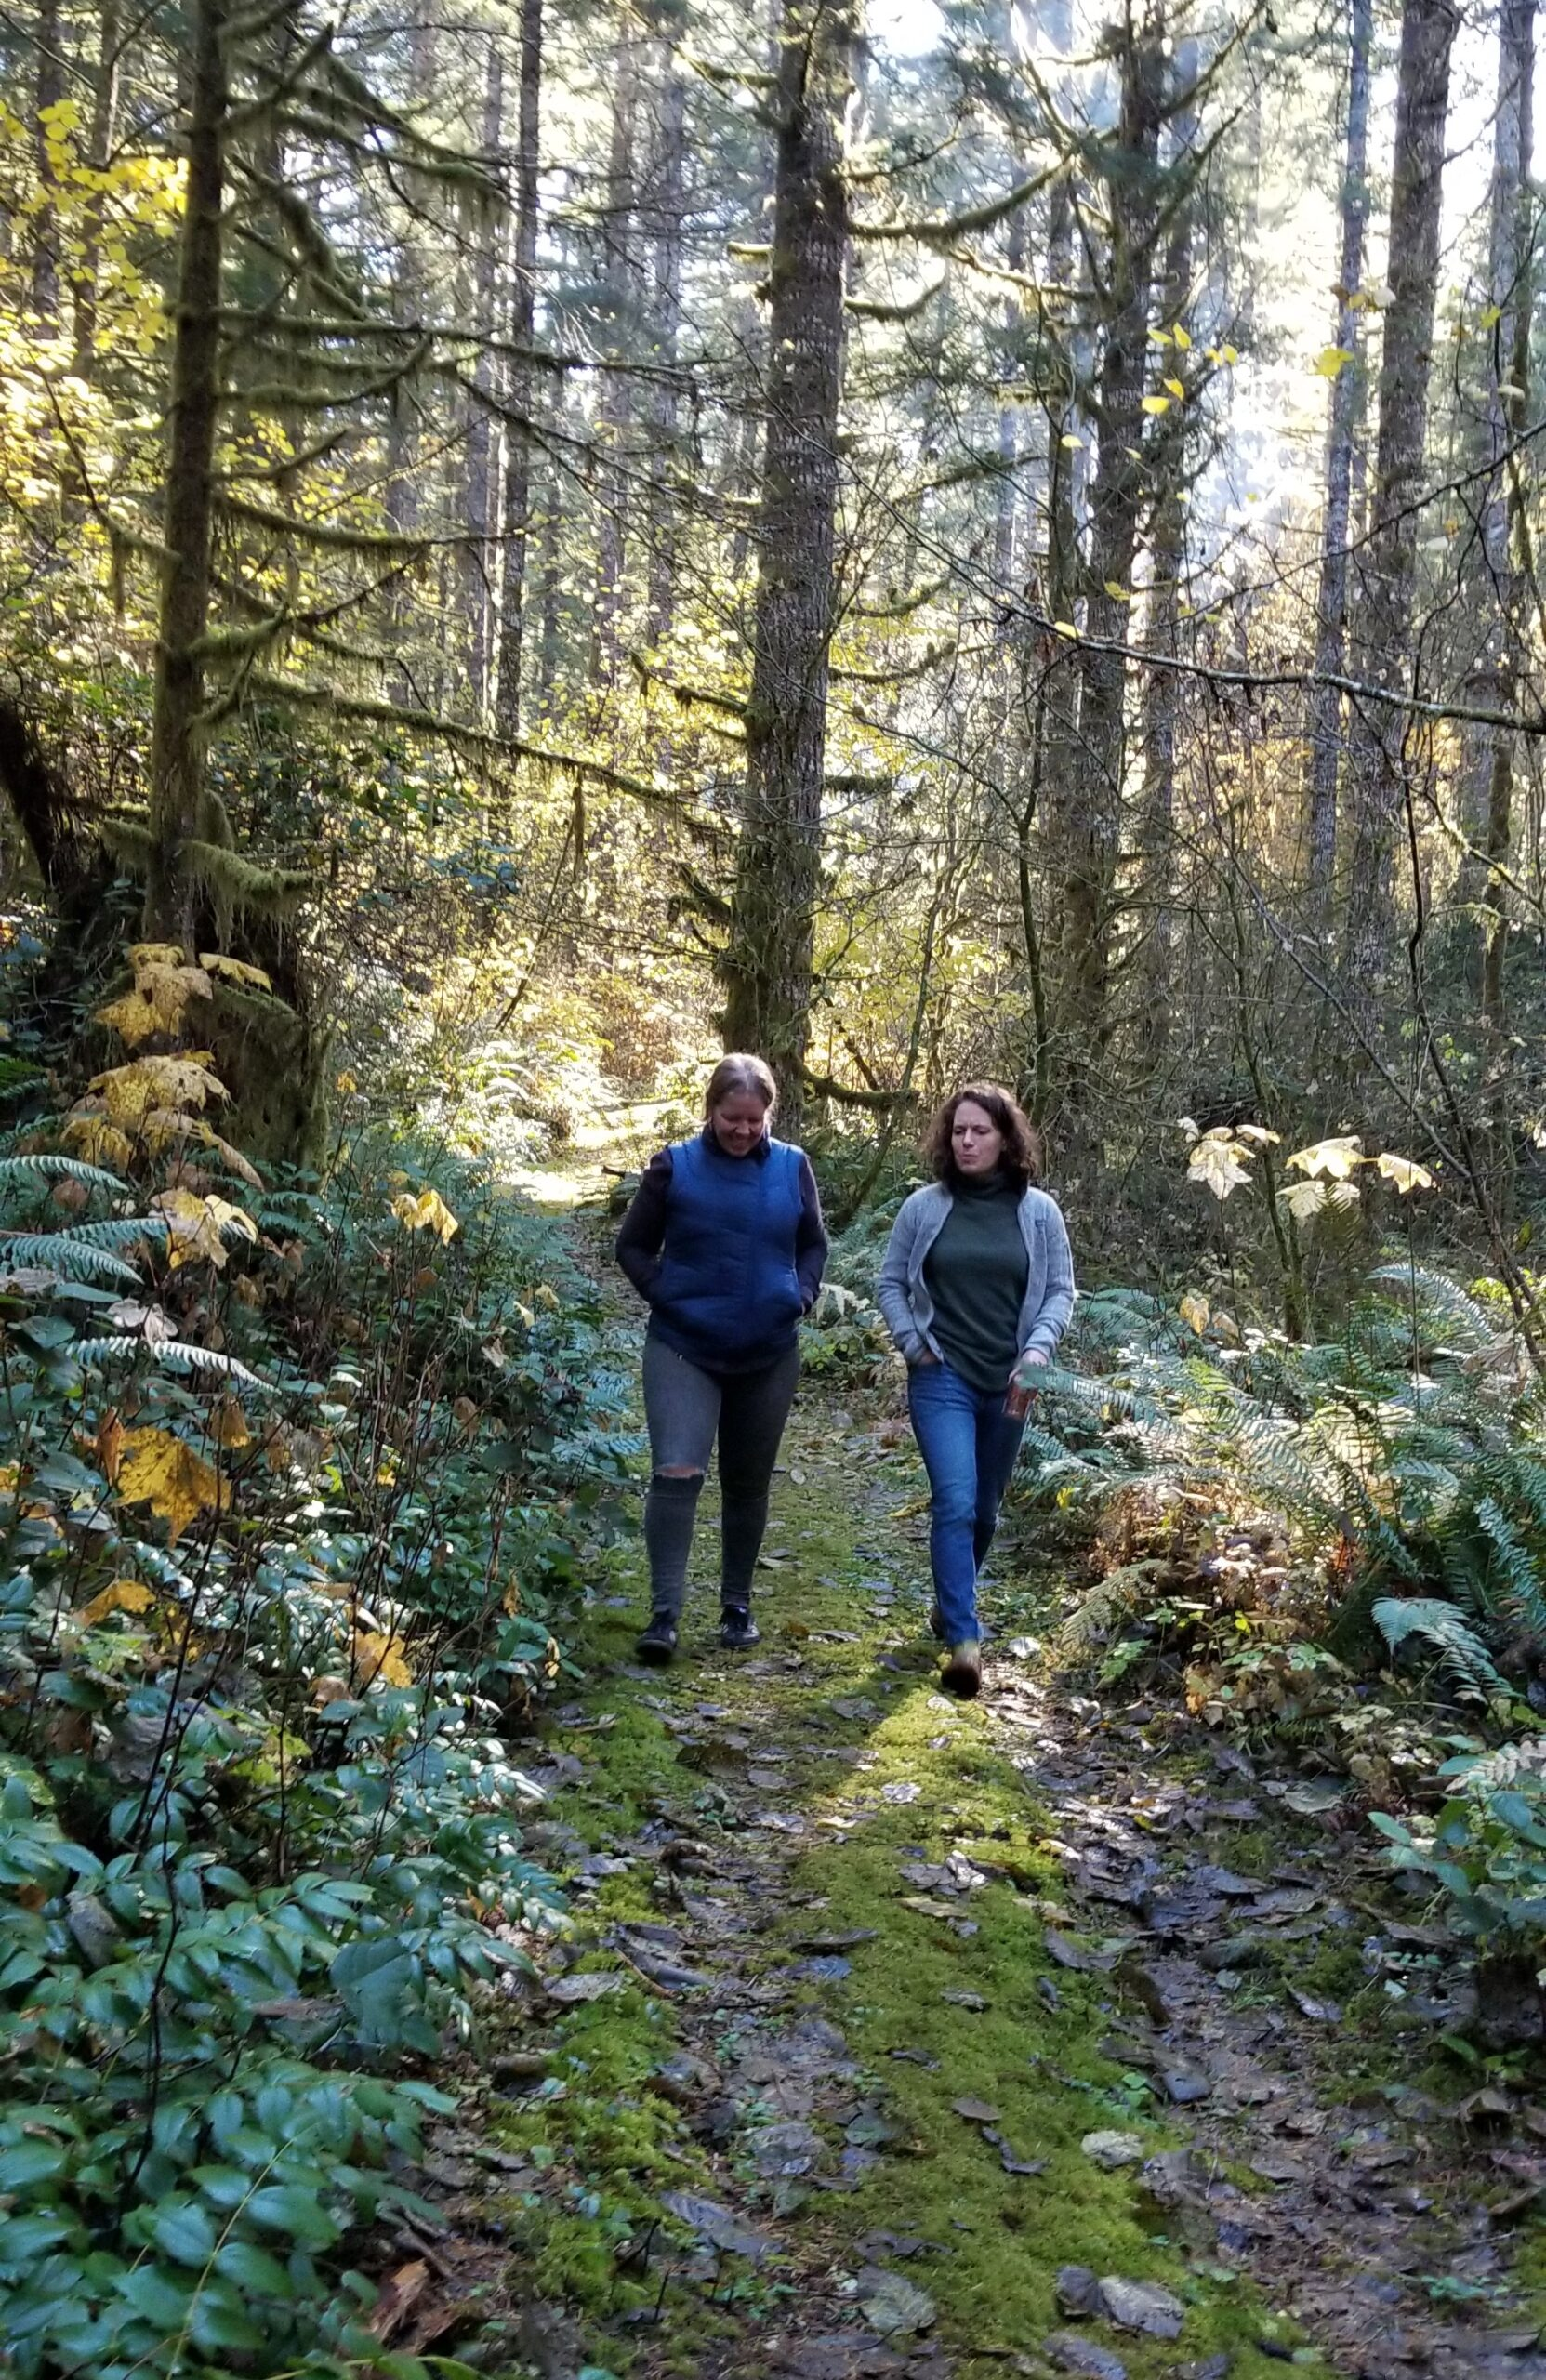 BLA board members take a walk in the woods.